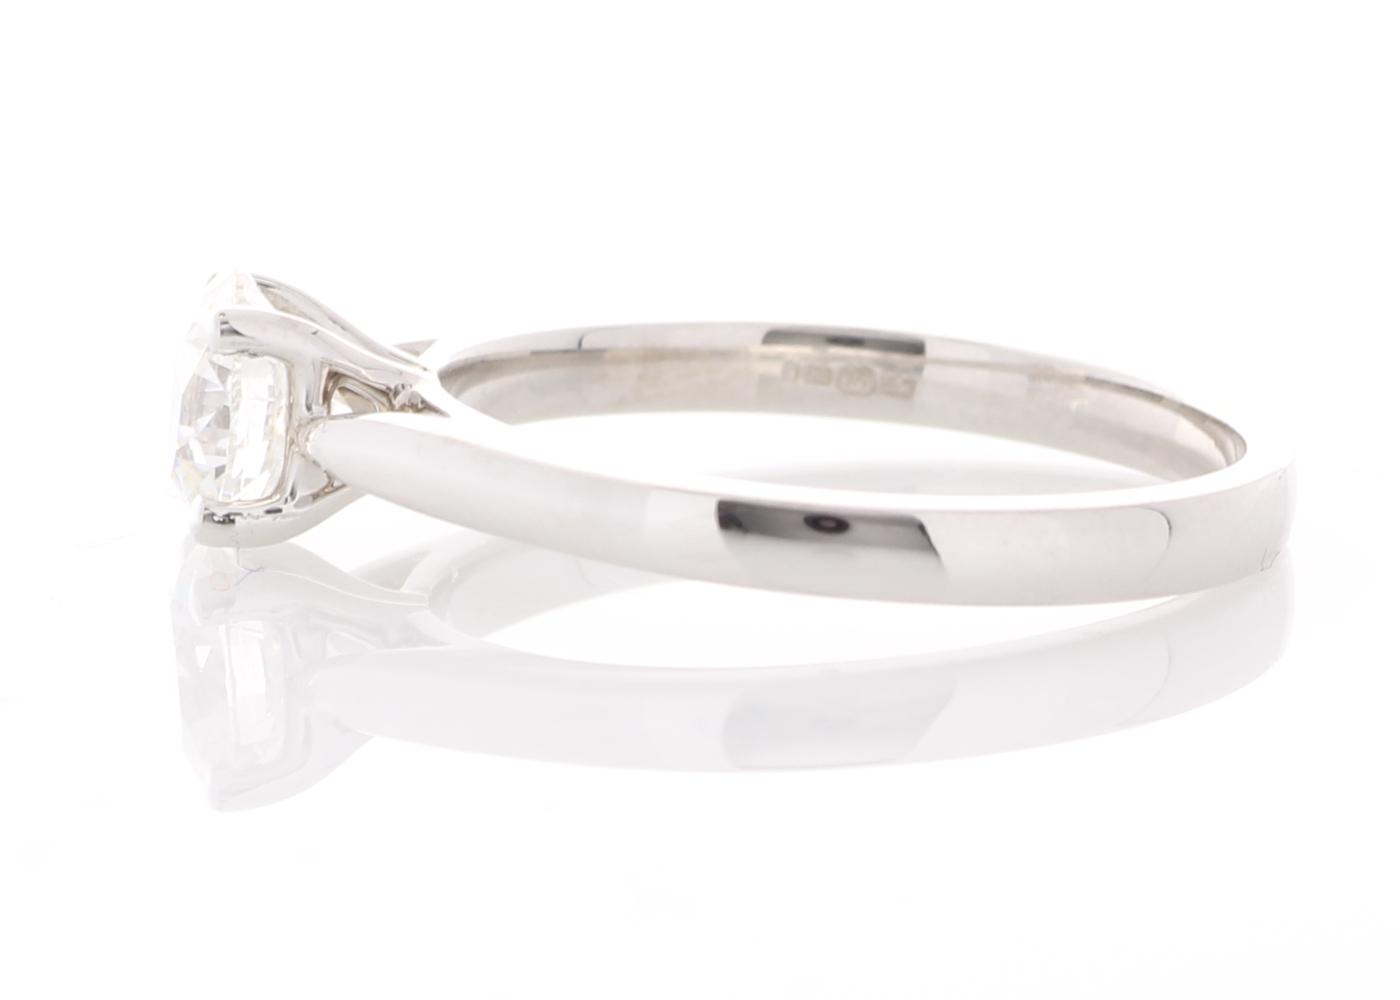 18ct White Gold Single Stone Prong Set Diamond Ring 0.73 Carats - Image 2 of 5